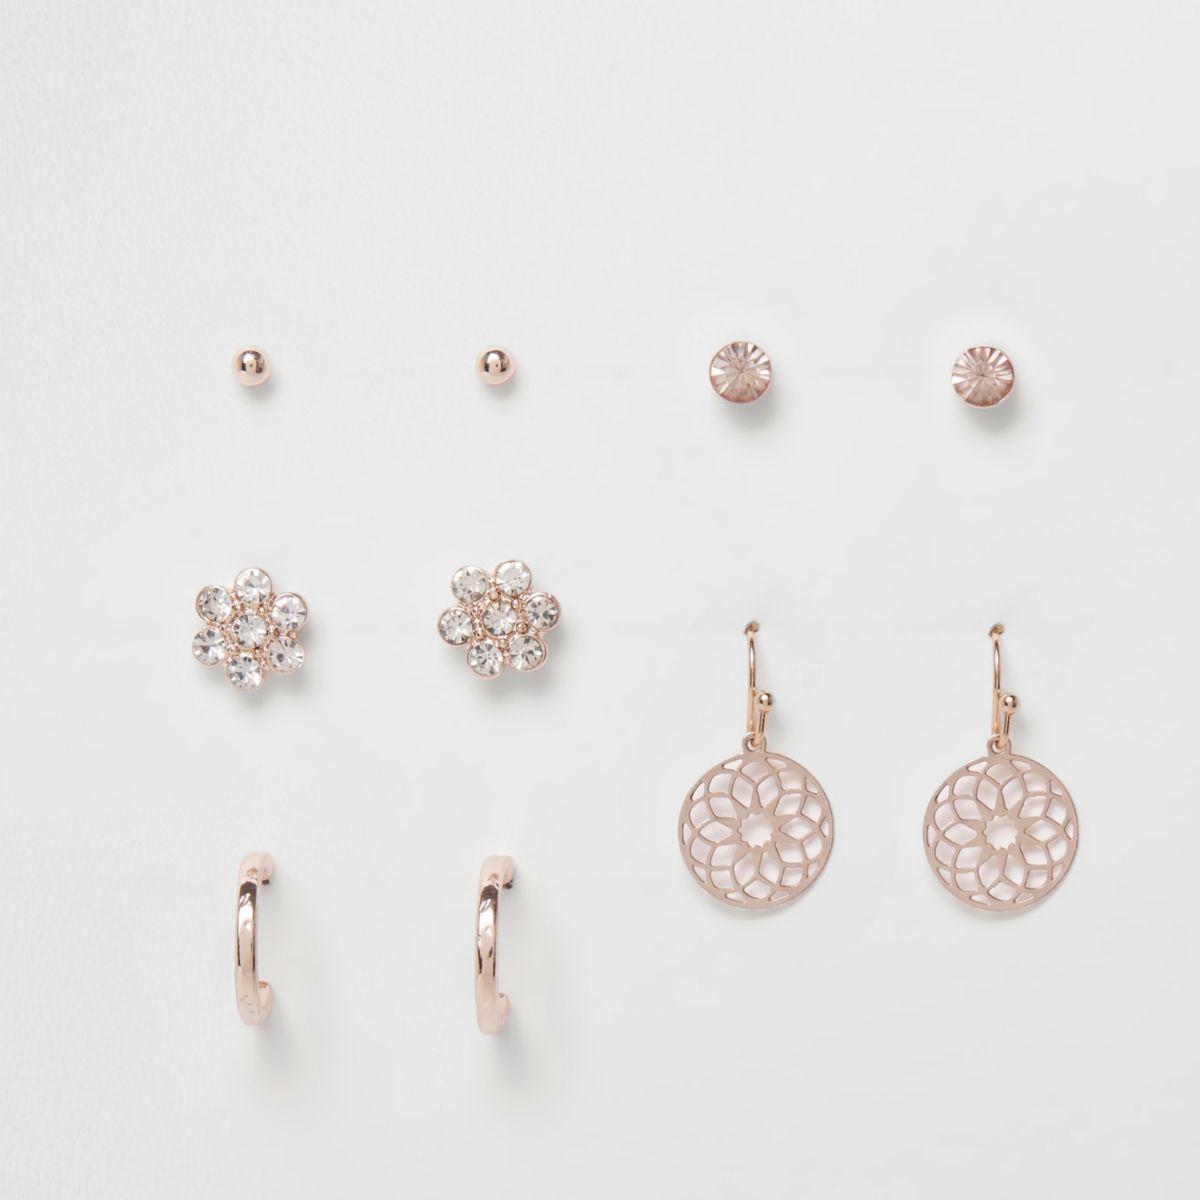 Rose gold tone filigree earrings pack